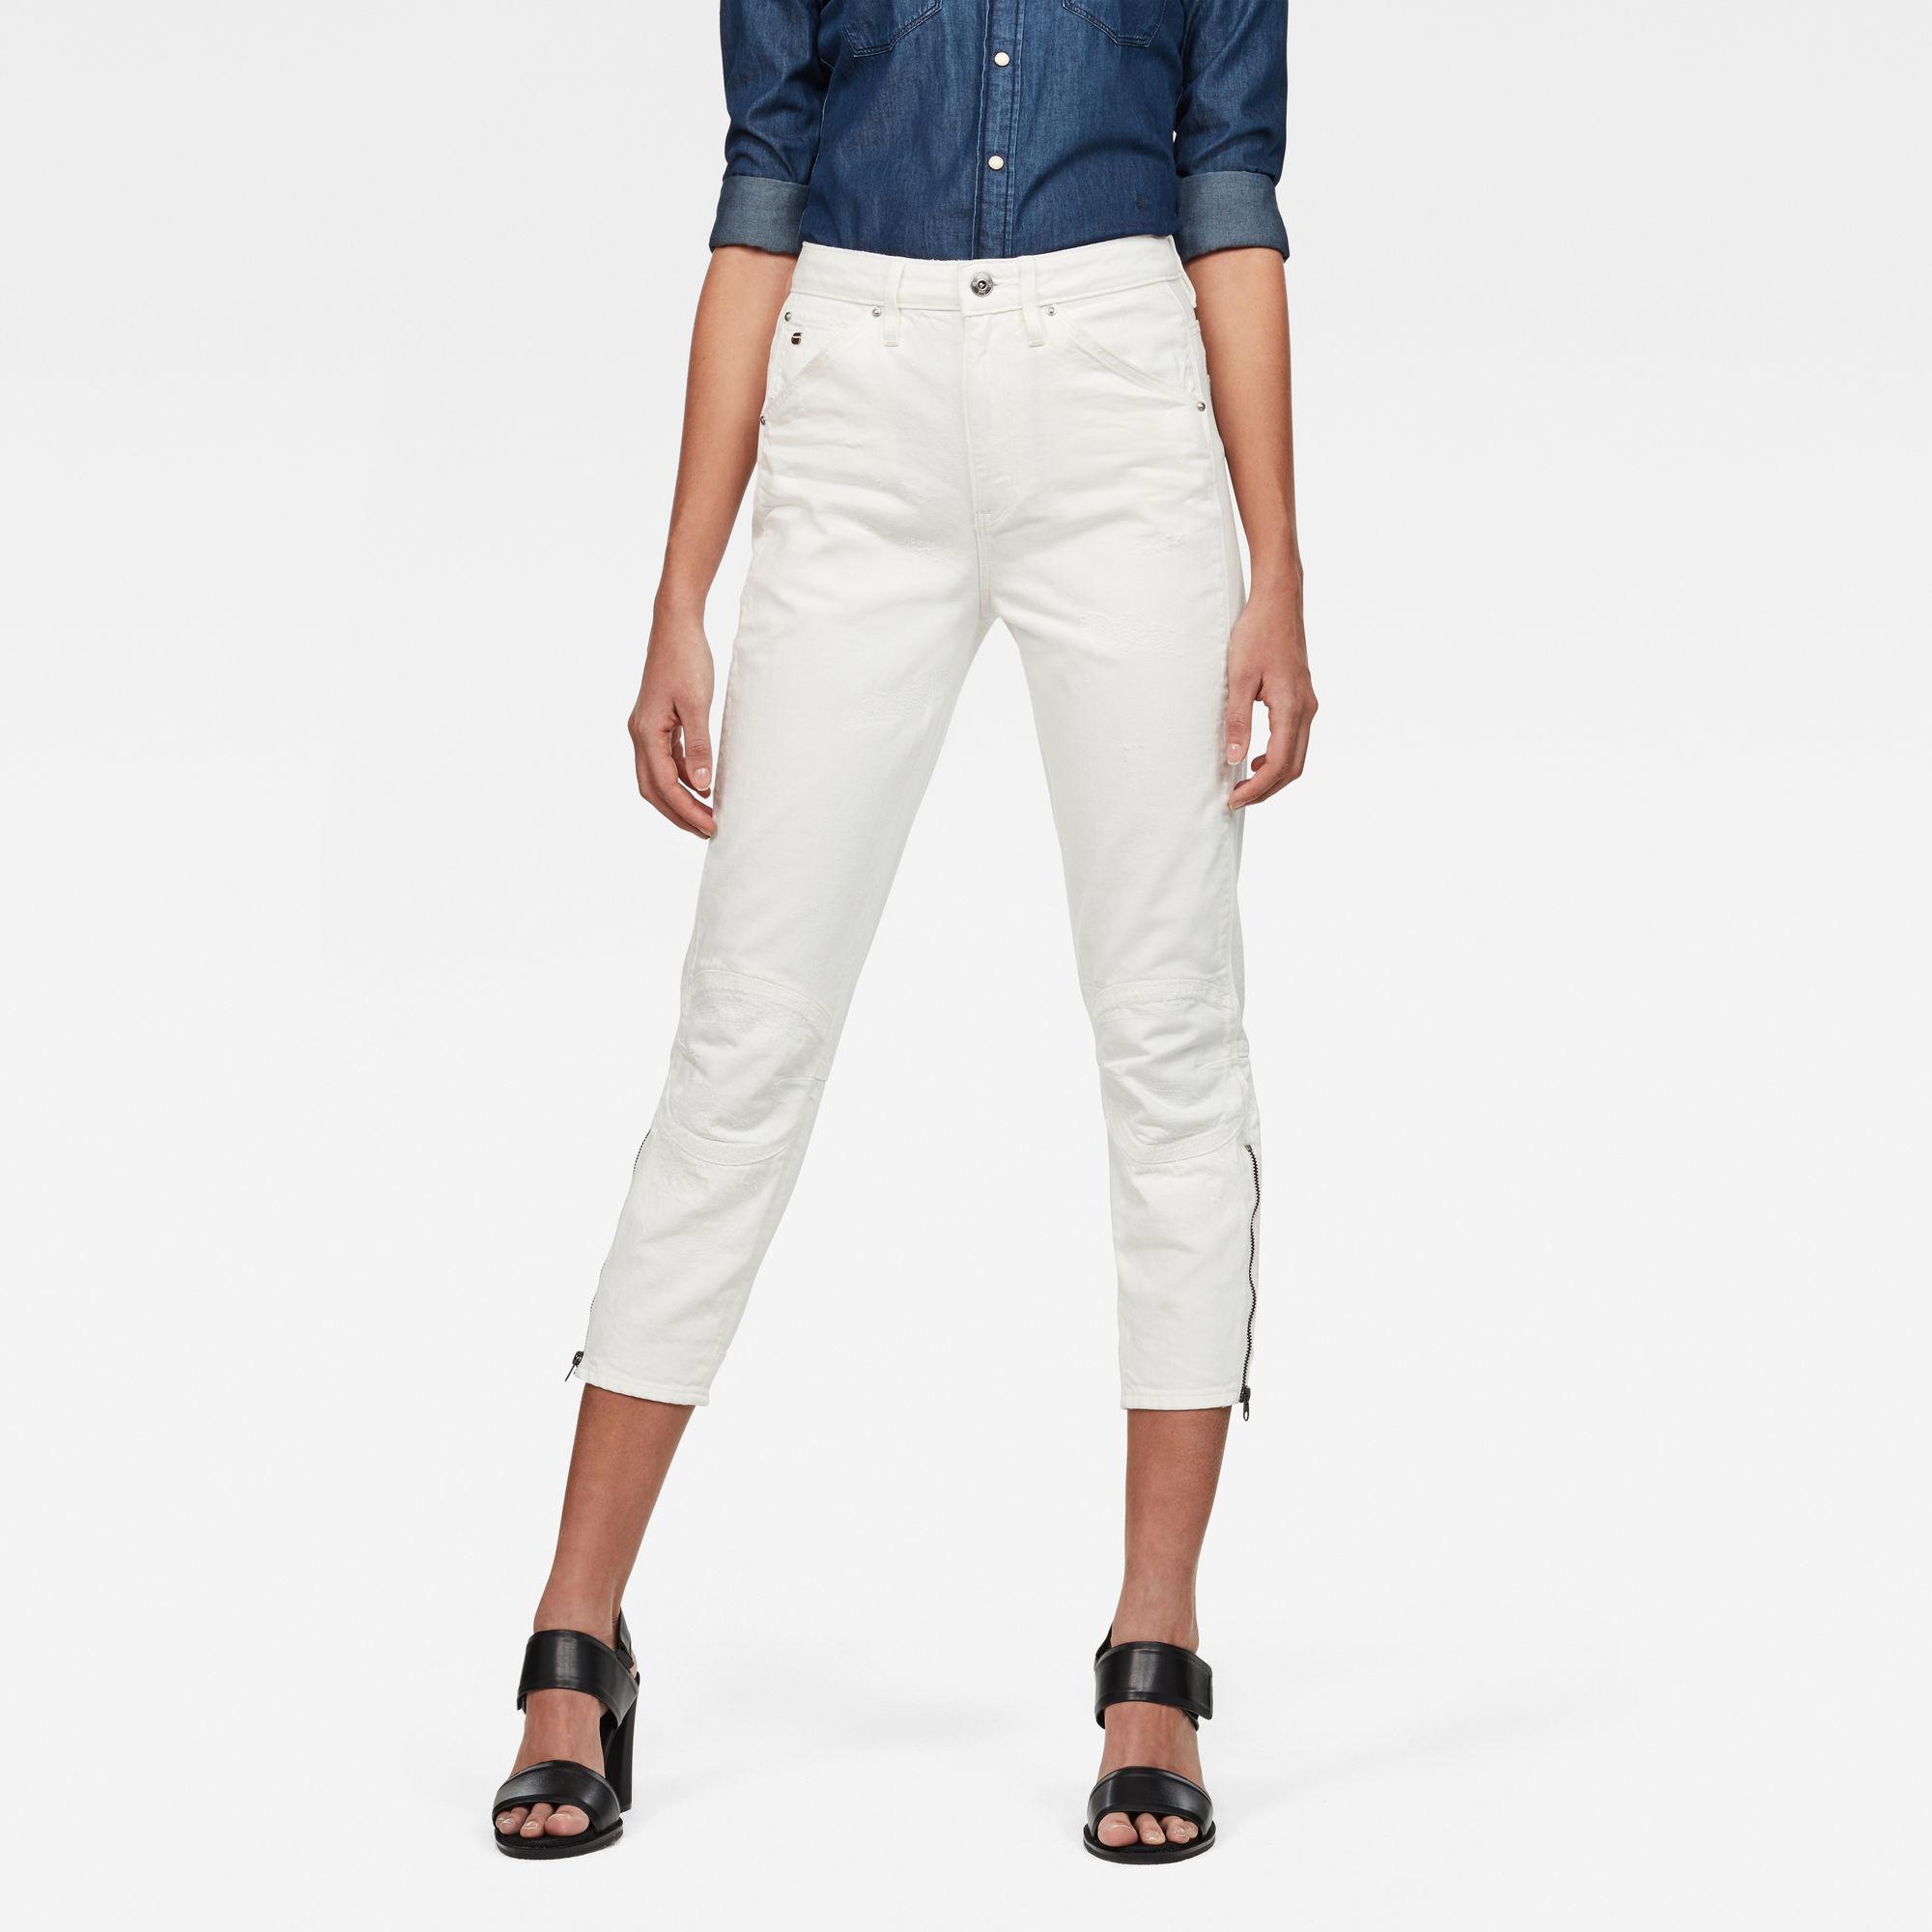 Raw Essentials 5622 Ultra High waist Straight 7 8 Jeans